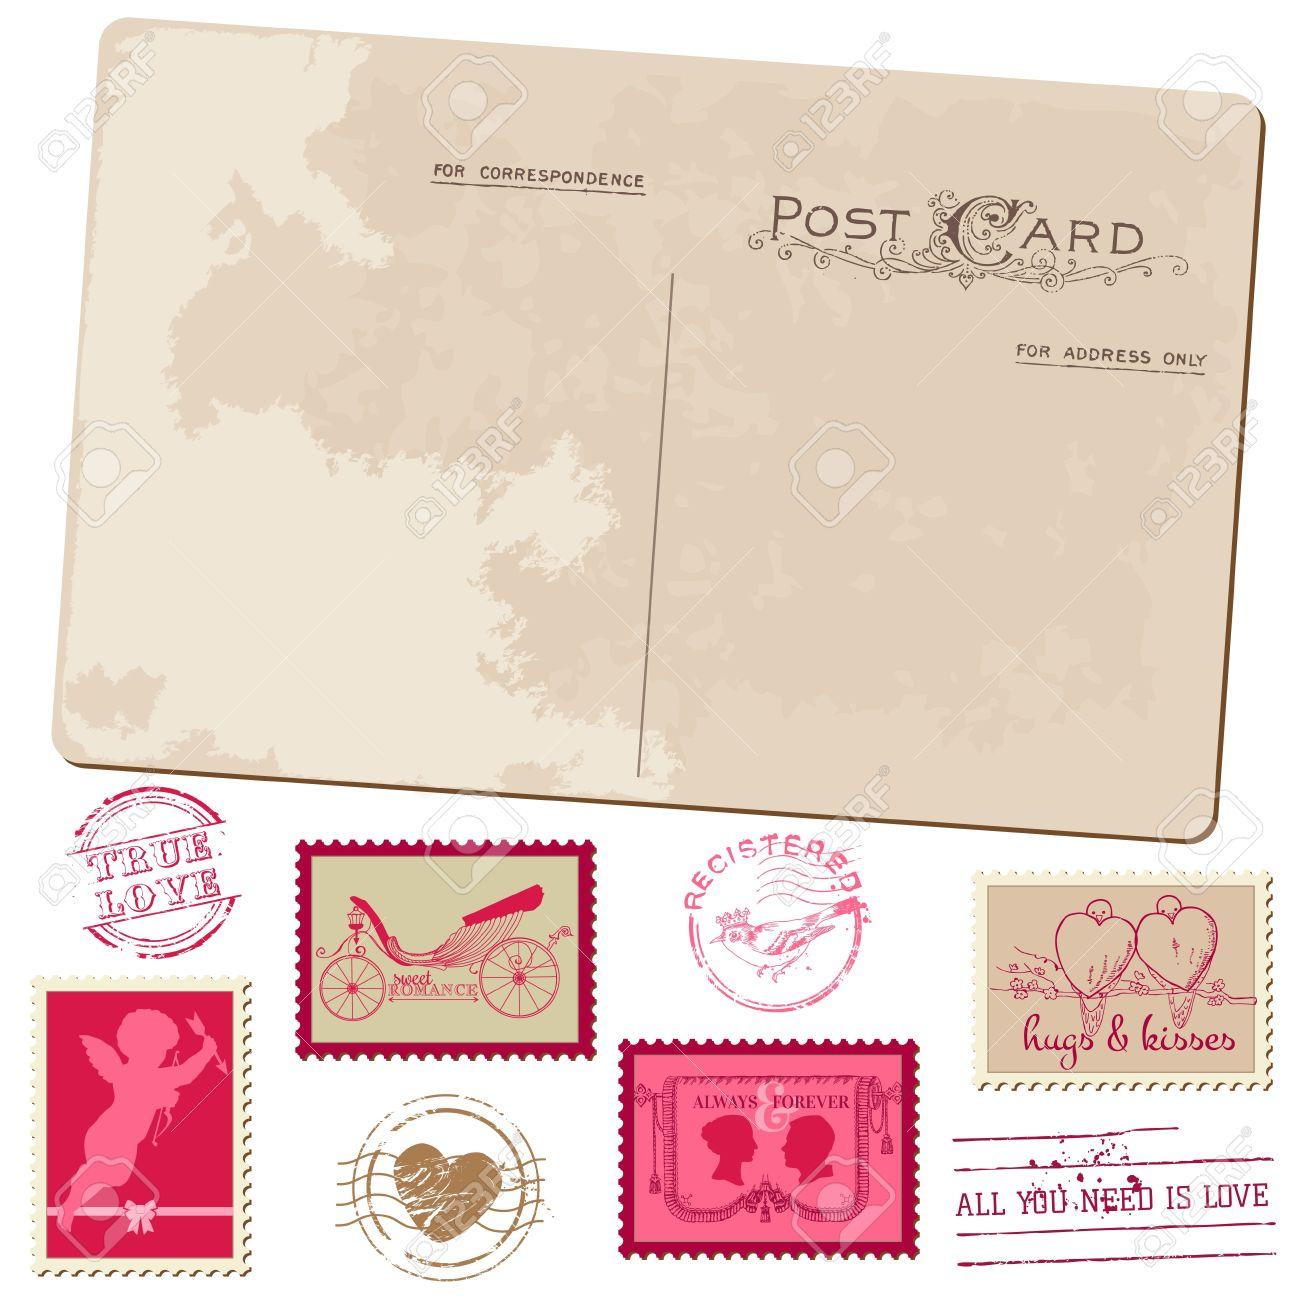 Vintage Postcard and Postage Stamps - for wedding design, invitation, congratulation, scrapbook Stock Vector - 16846515